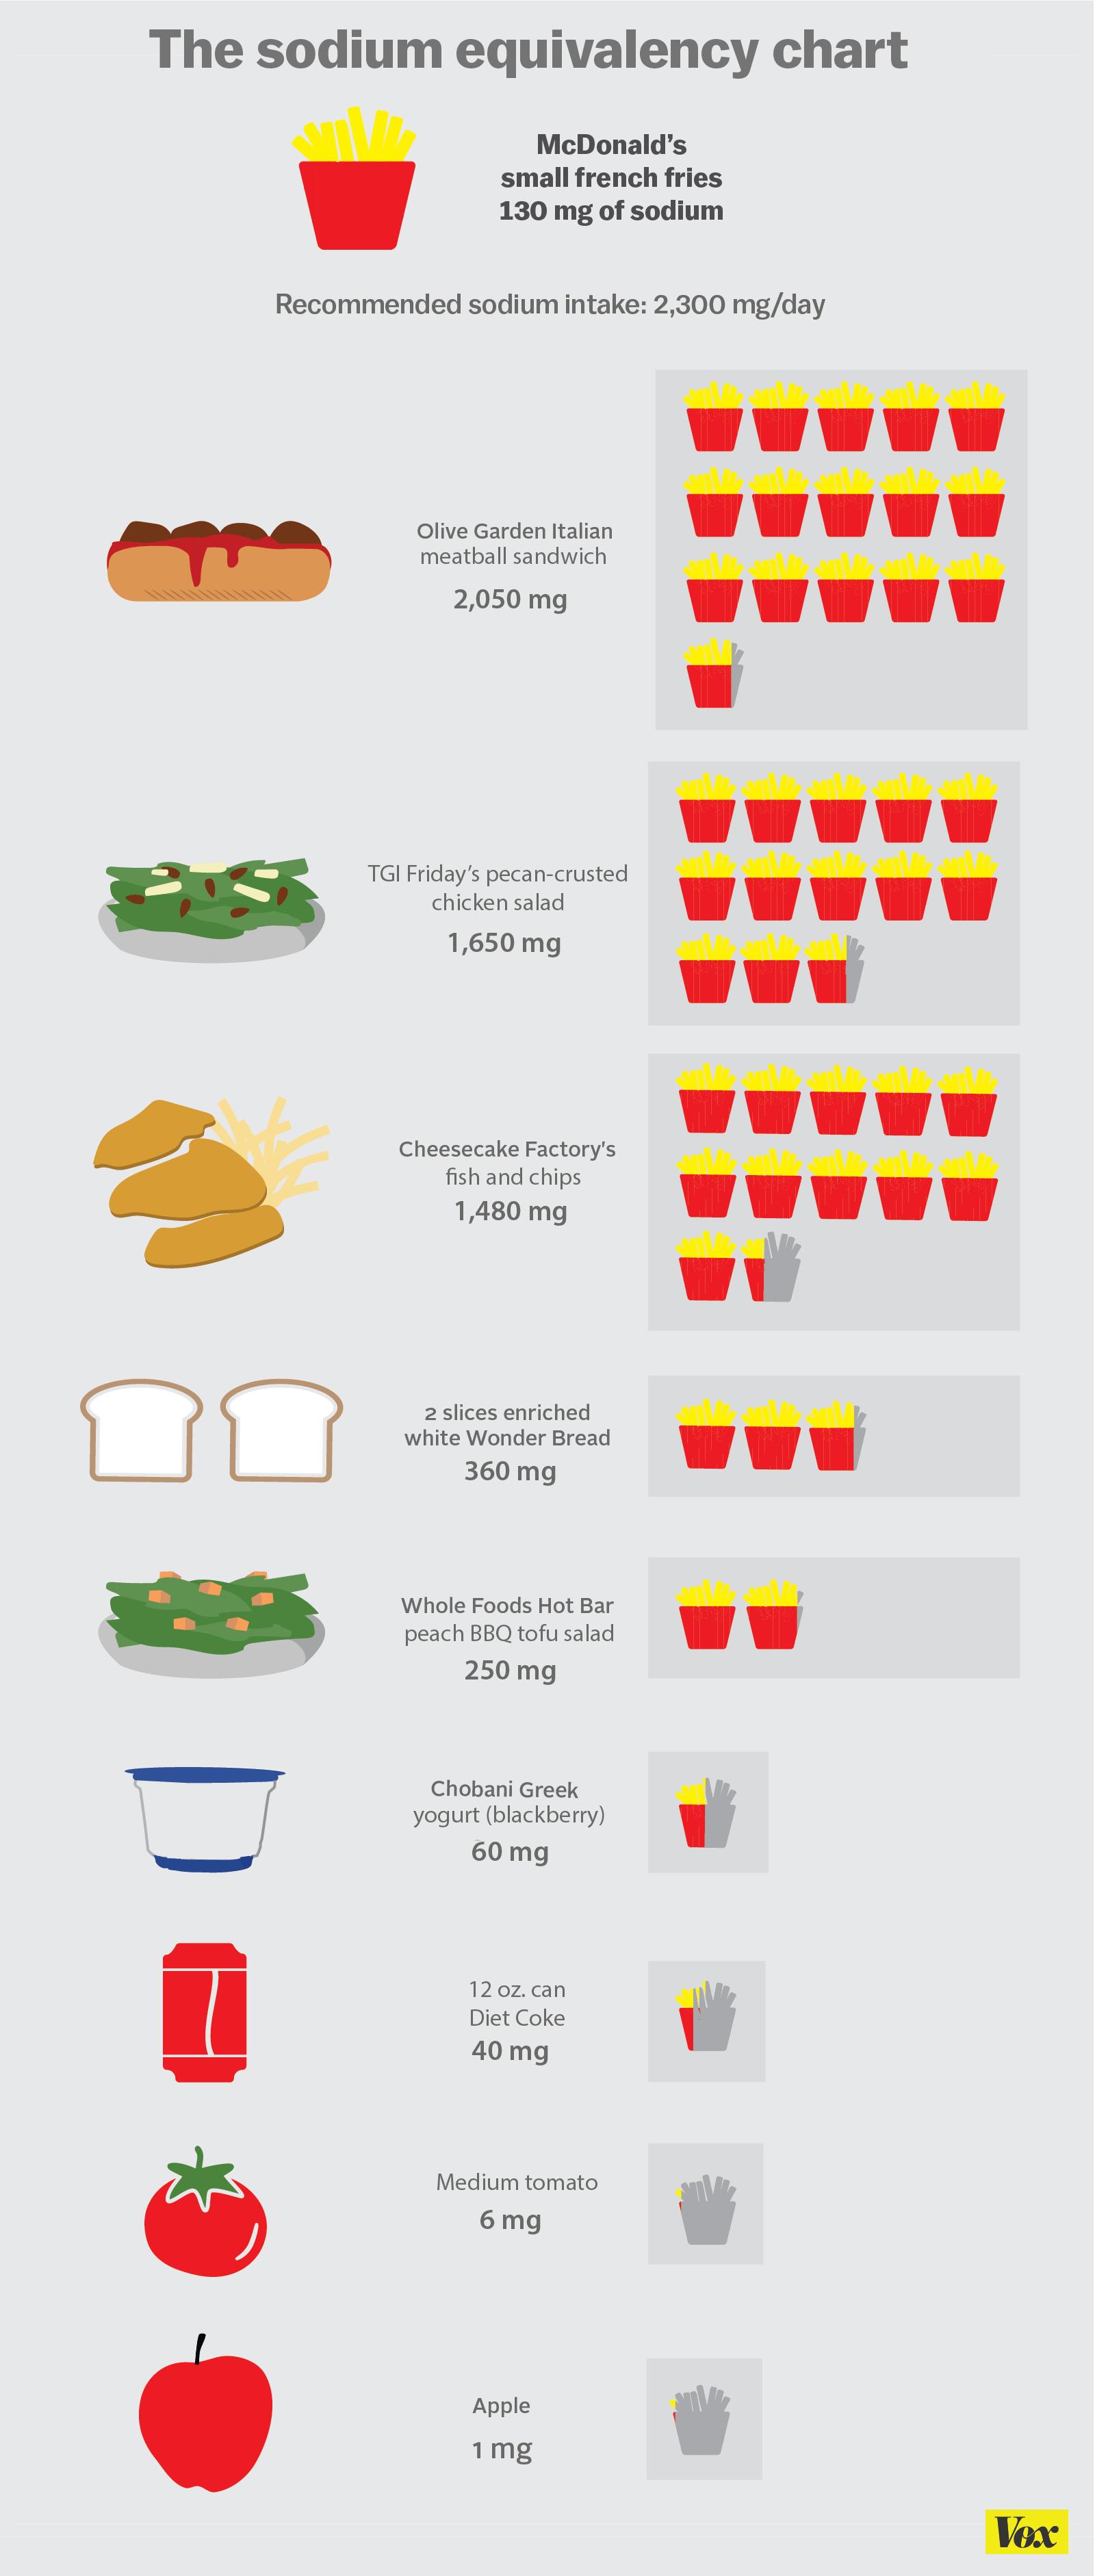 Restaurants That Offer Low Sodium Foods